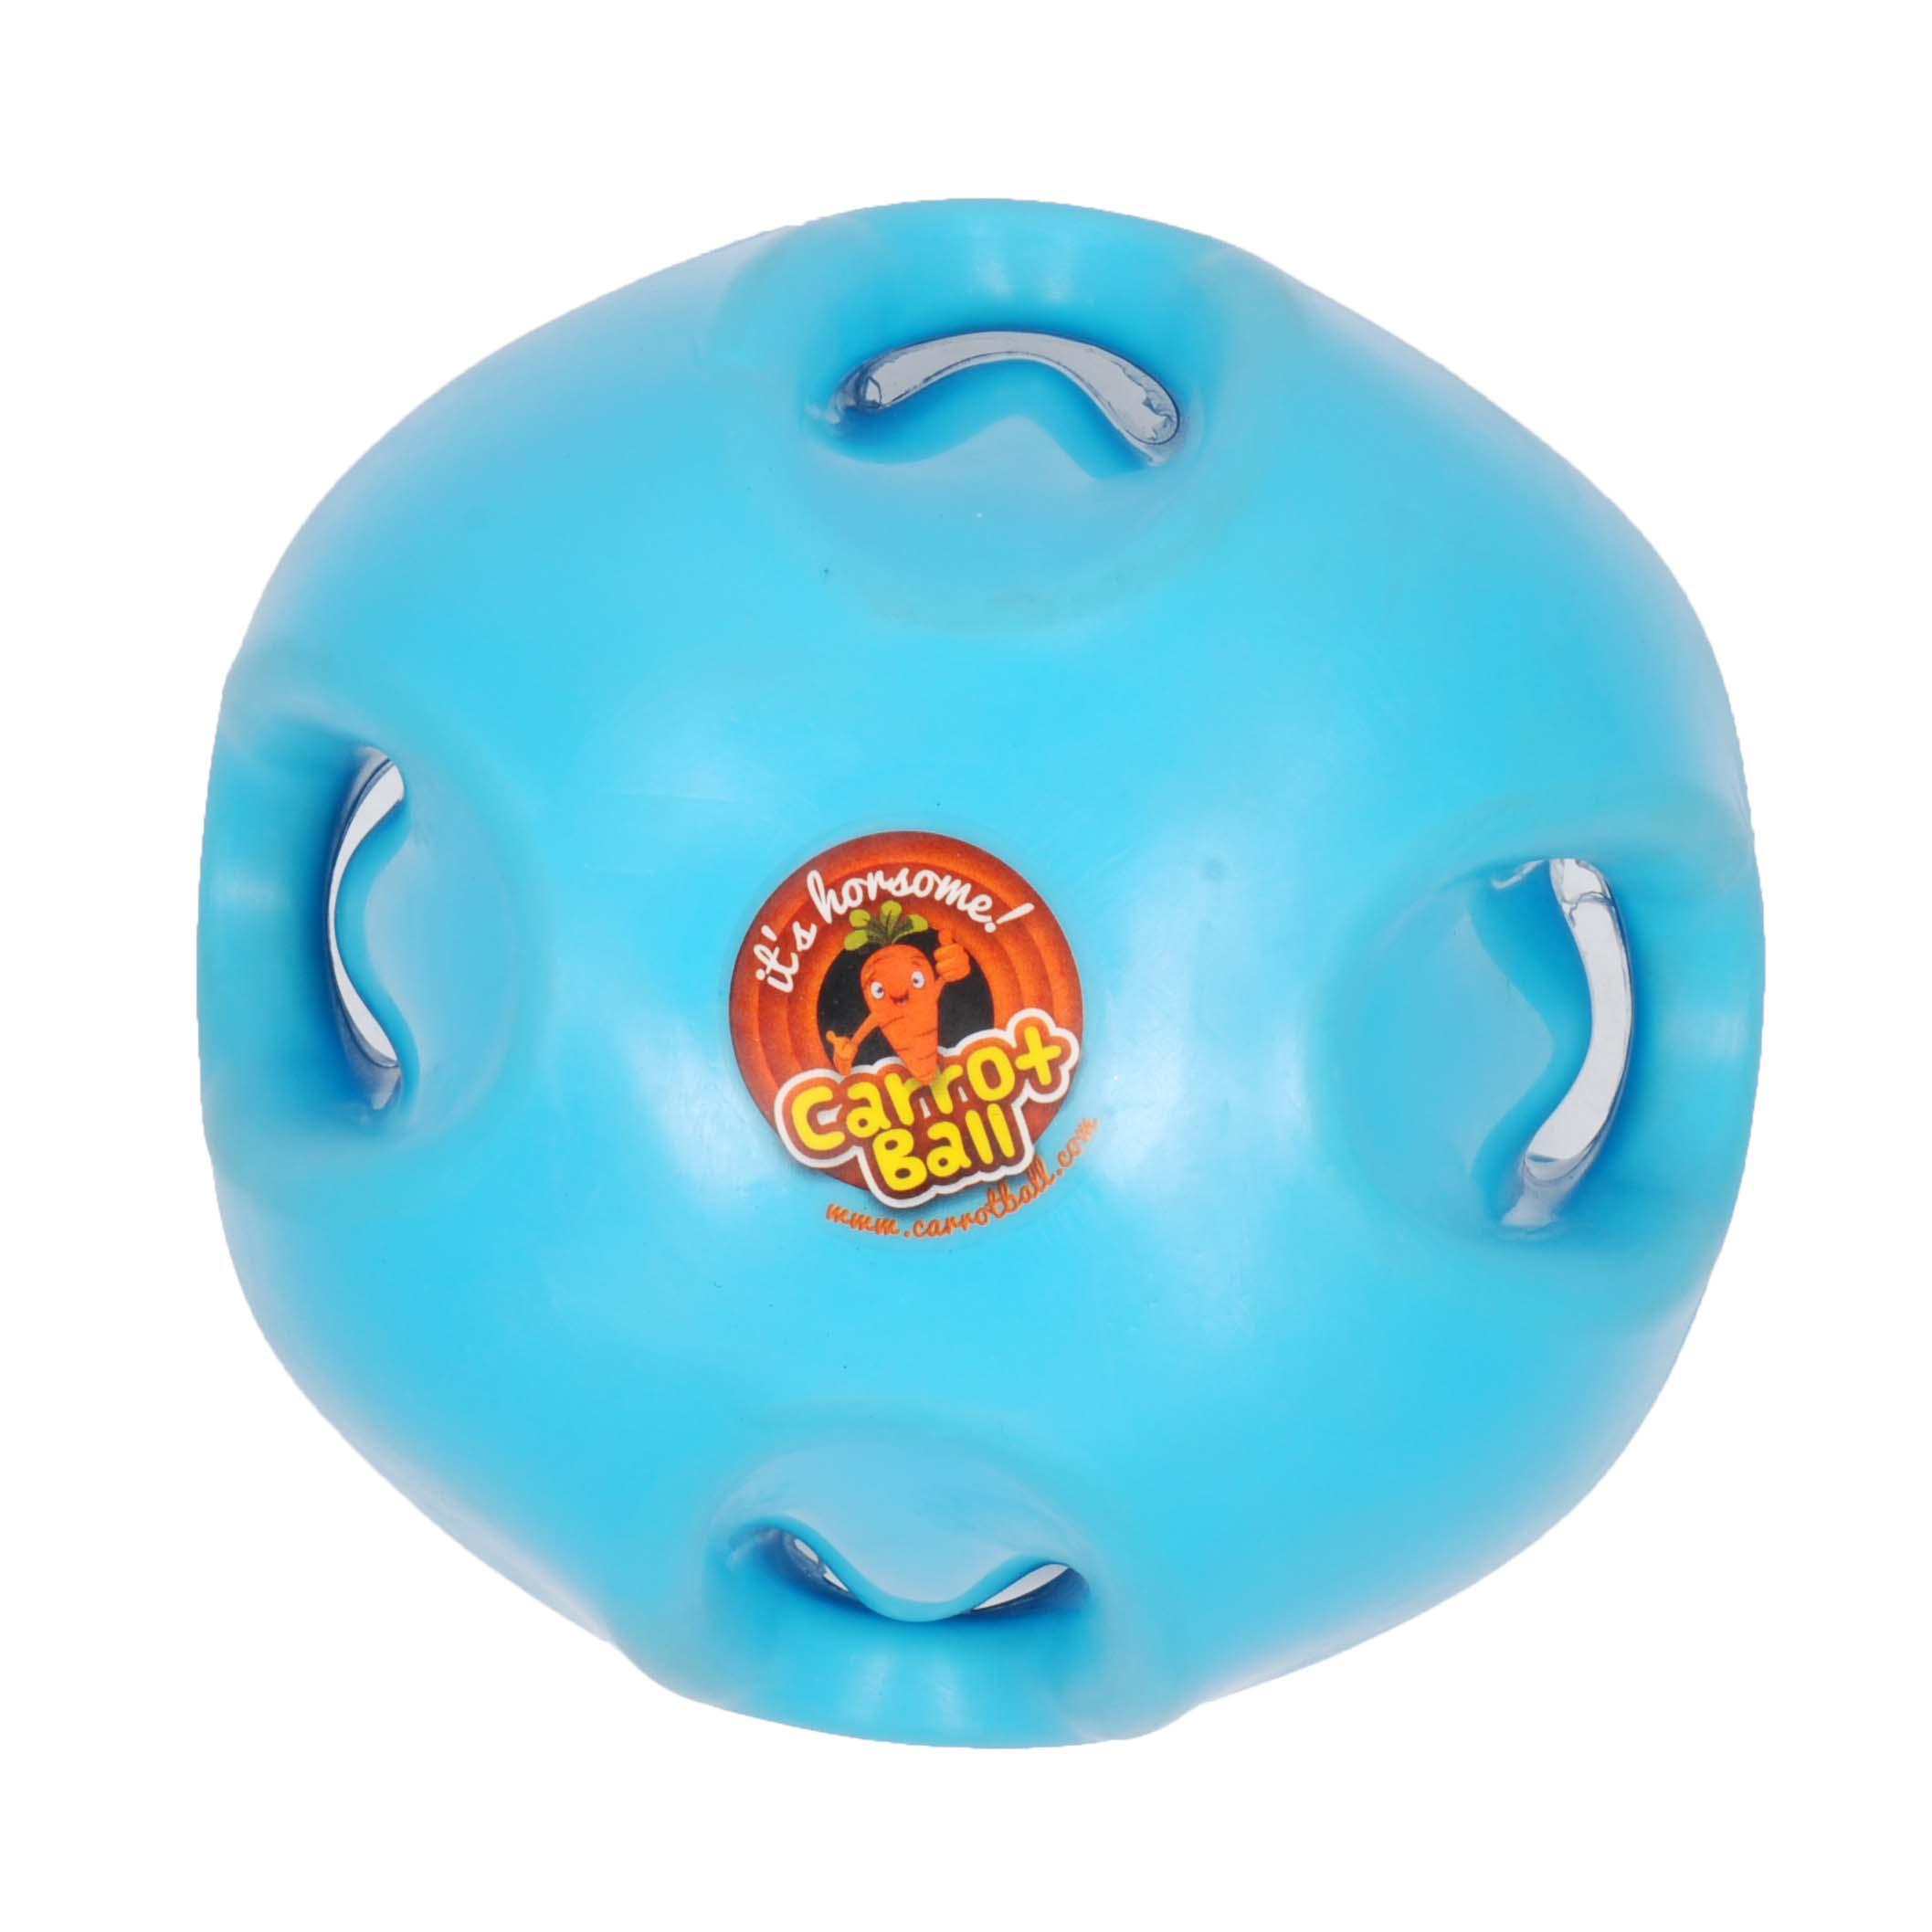 Shires Carrot Ball blauw